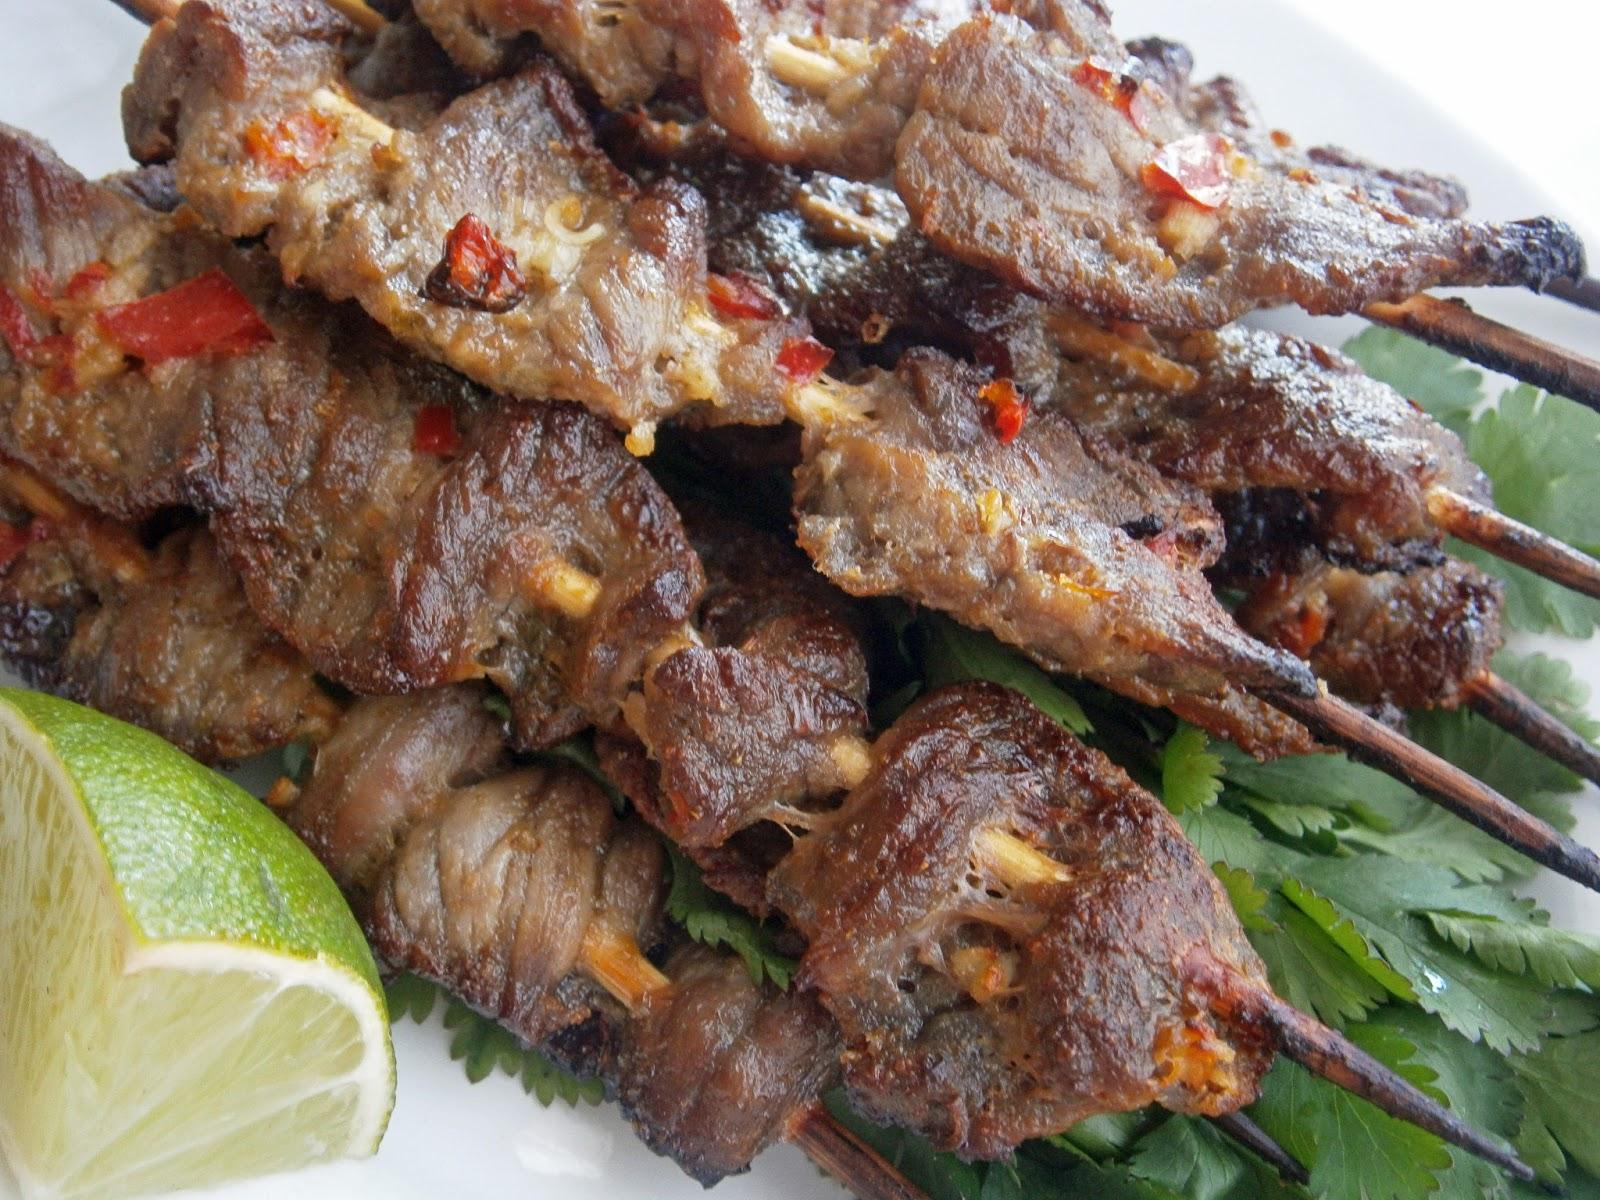 Indonesian beef satays - beef + coconut milk + garlic + red chilli ...